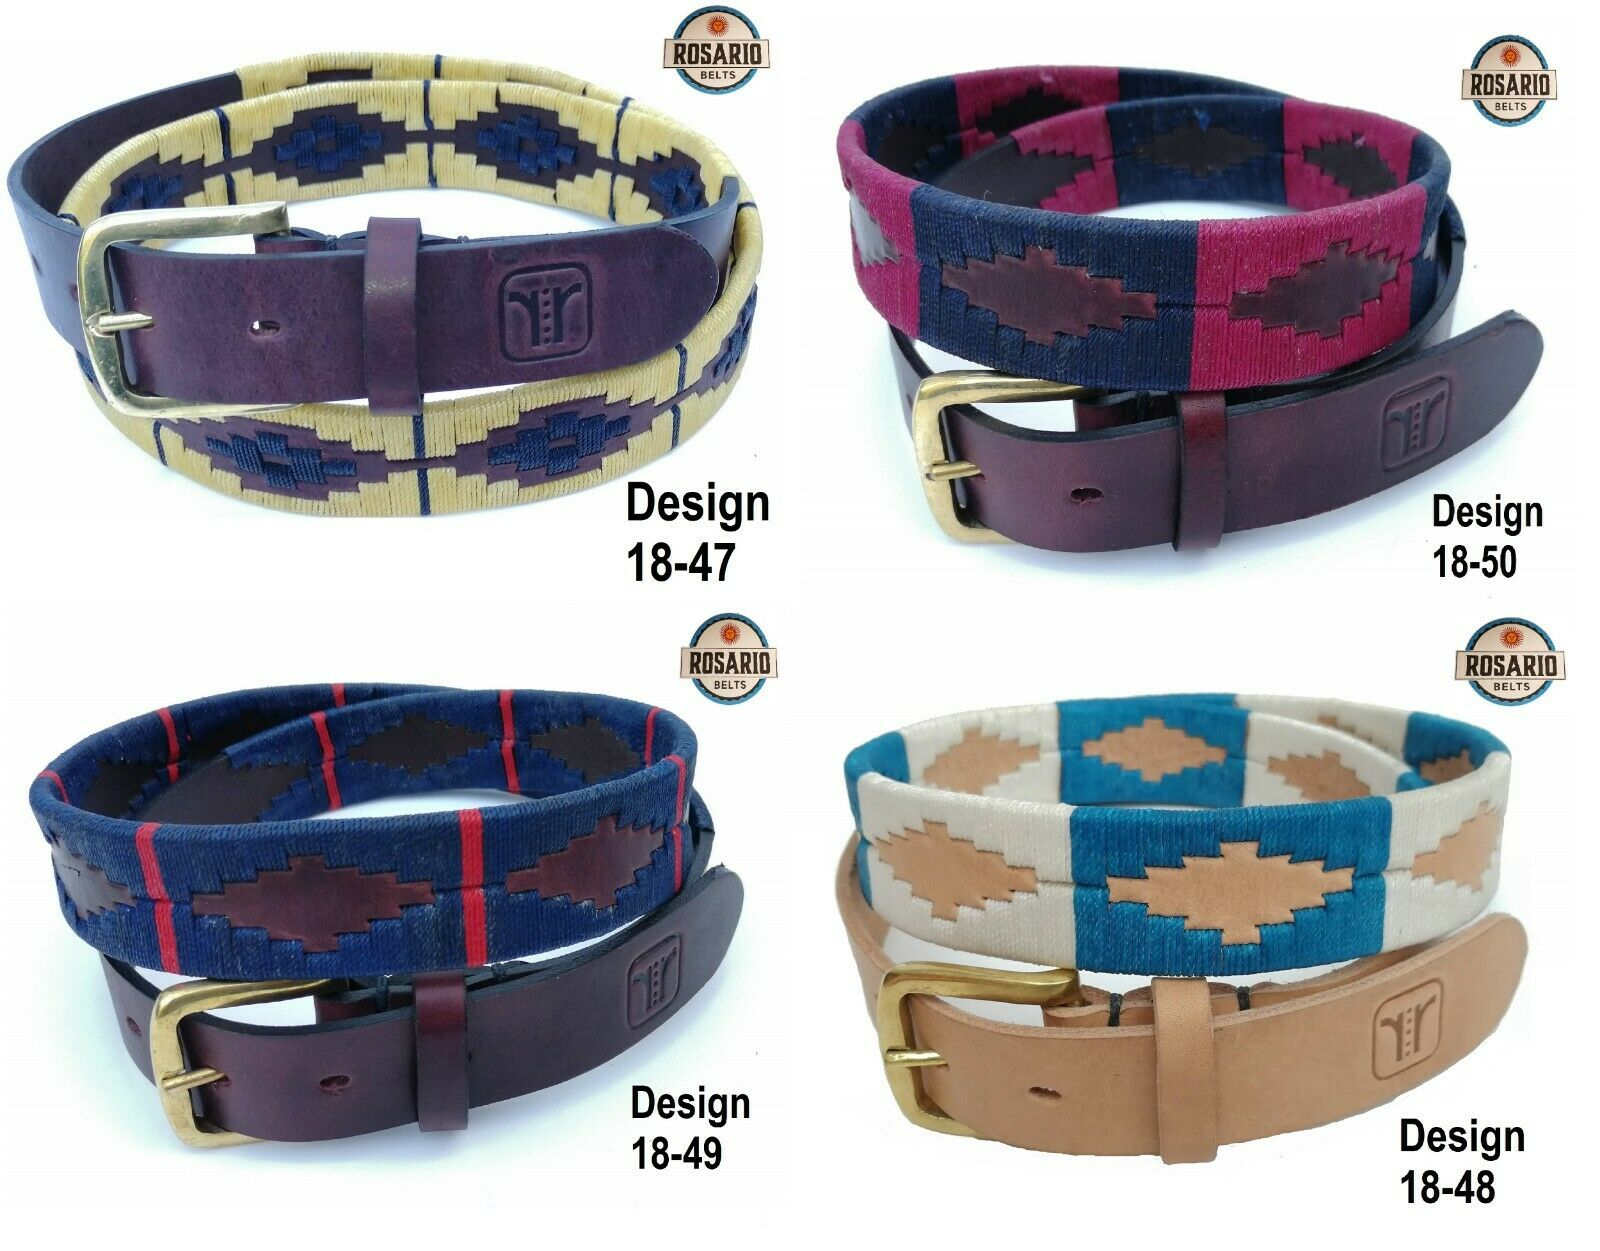 Polo Belt silverinian Gaucho Brown Leather Belt PLUS FREE KEYRING